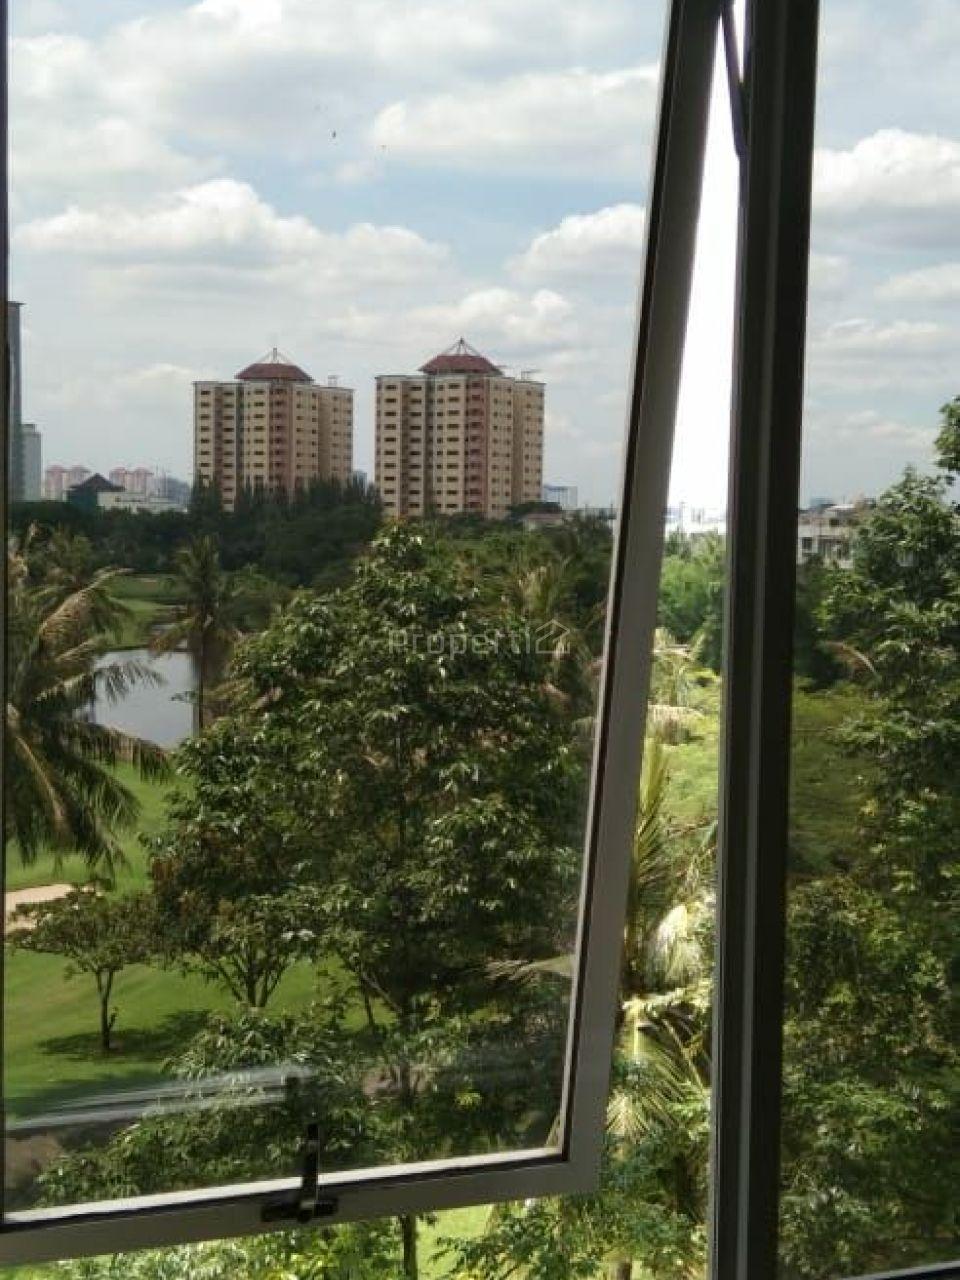 2BR Apartment Unit at Tower Jasmine The Mansion, 5th Floor, DKI Jakarta